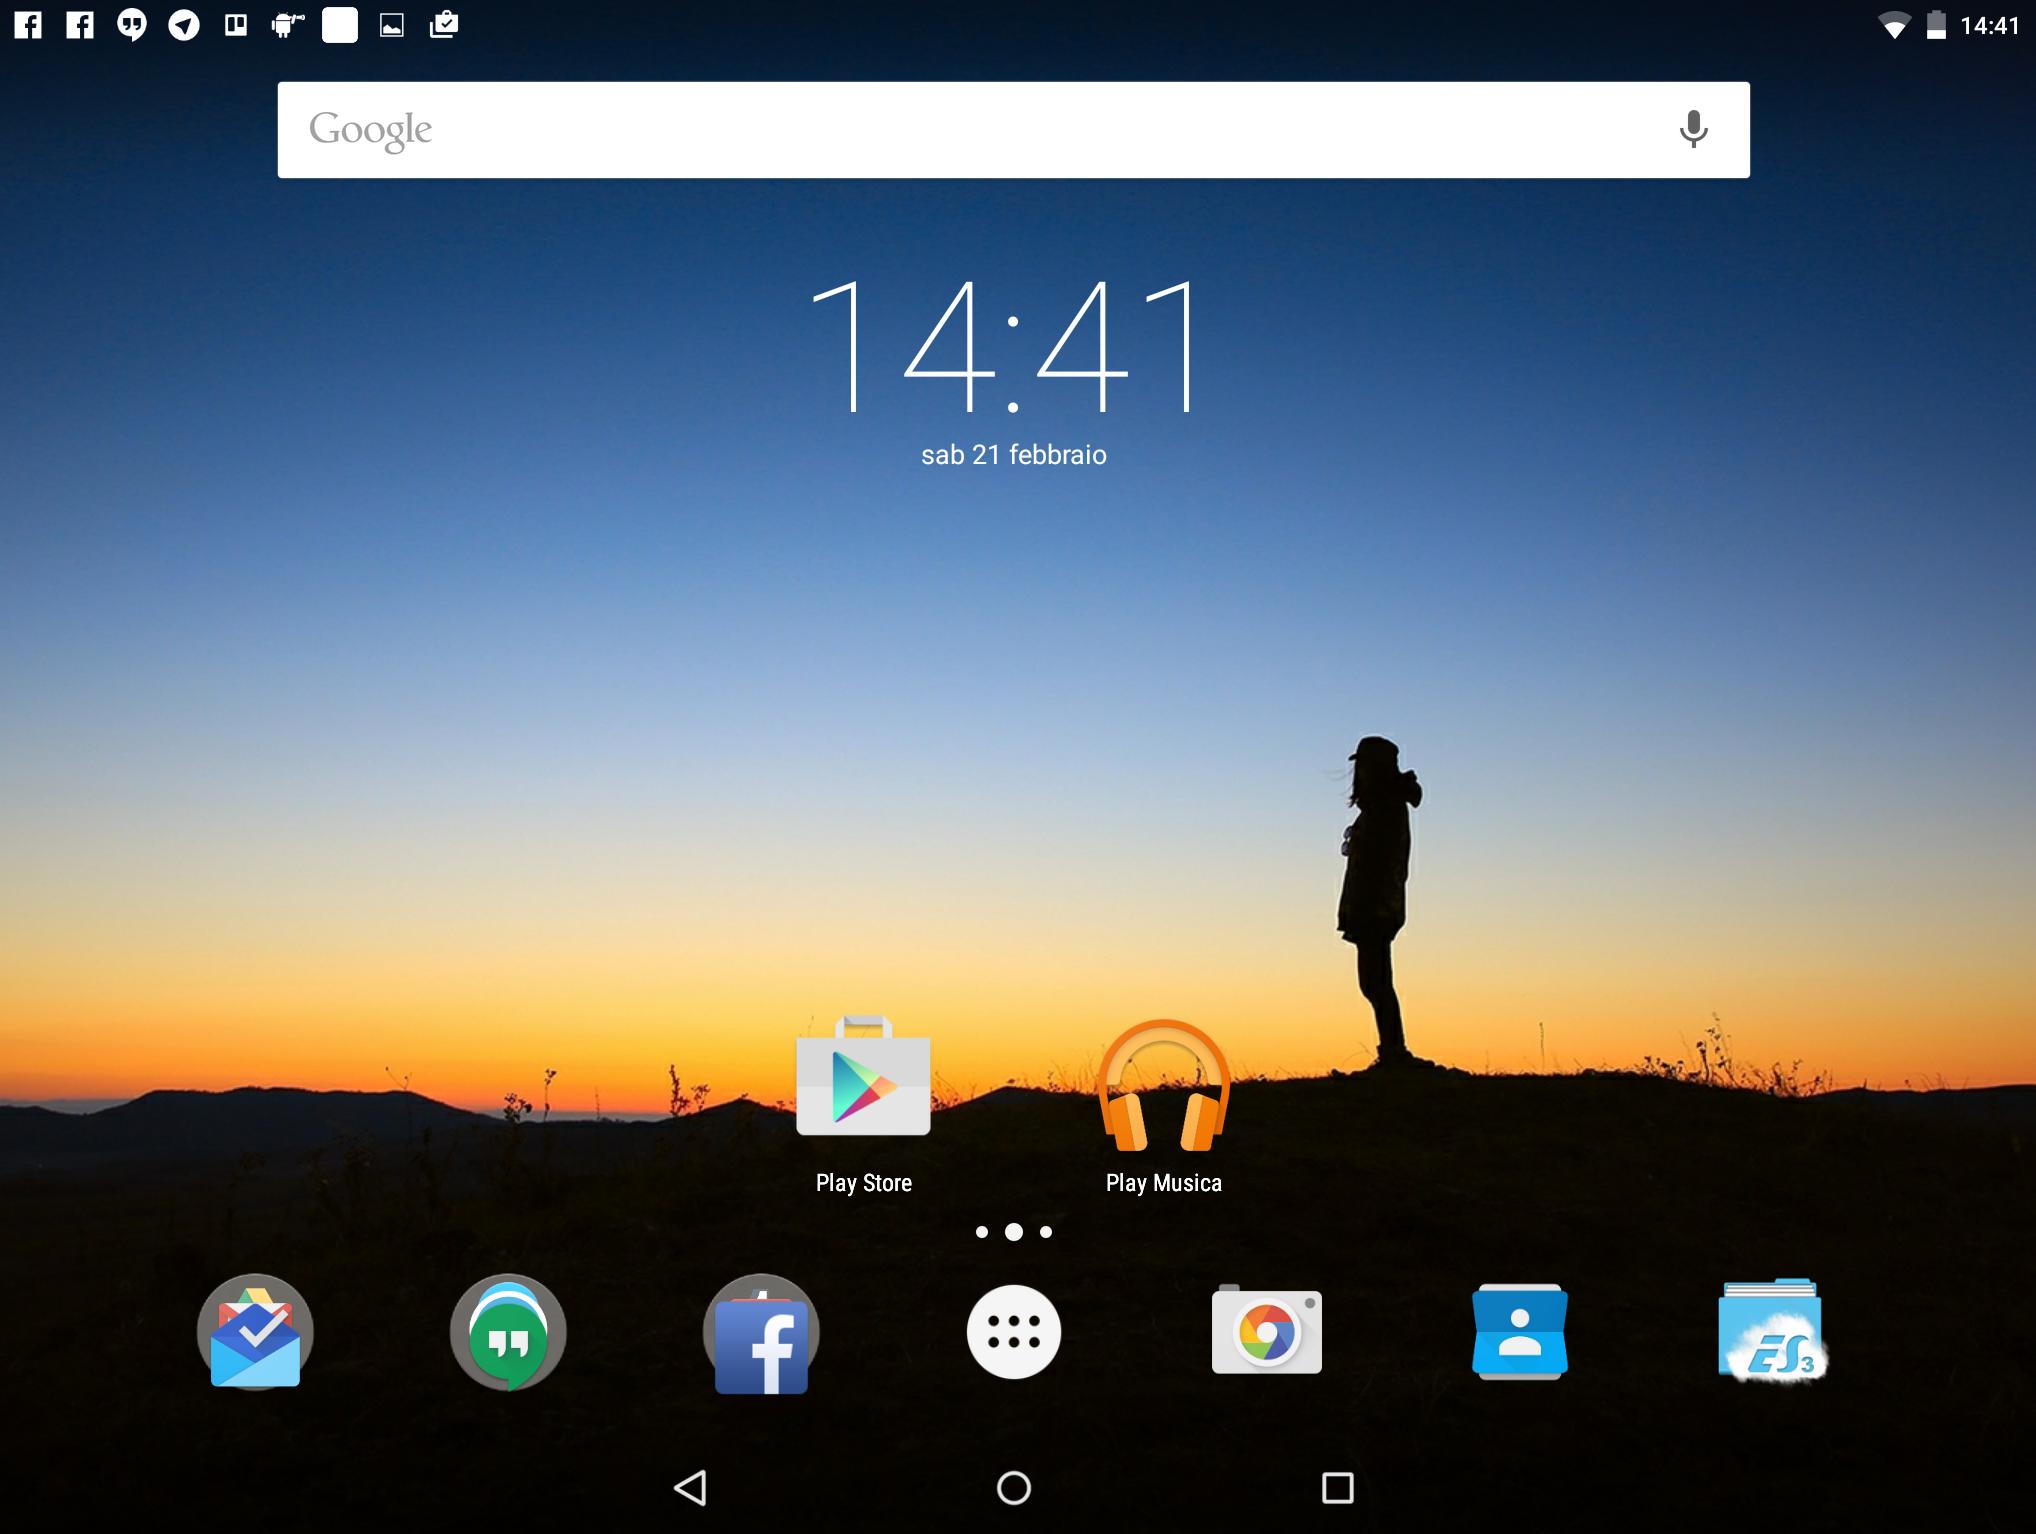 Screenshot_2015-02-21-14-41-54_modificata